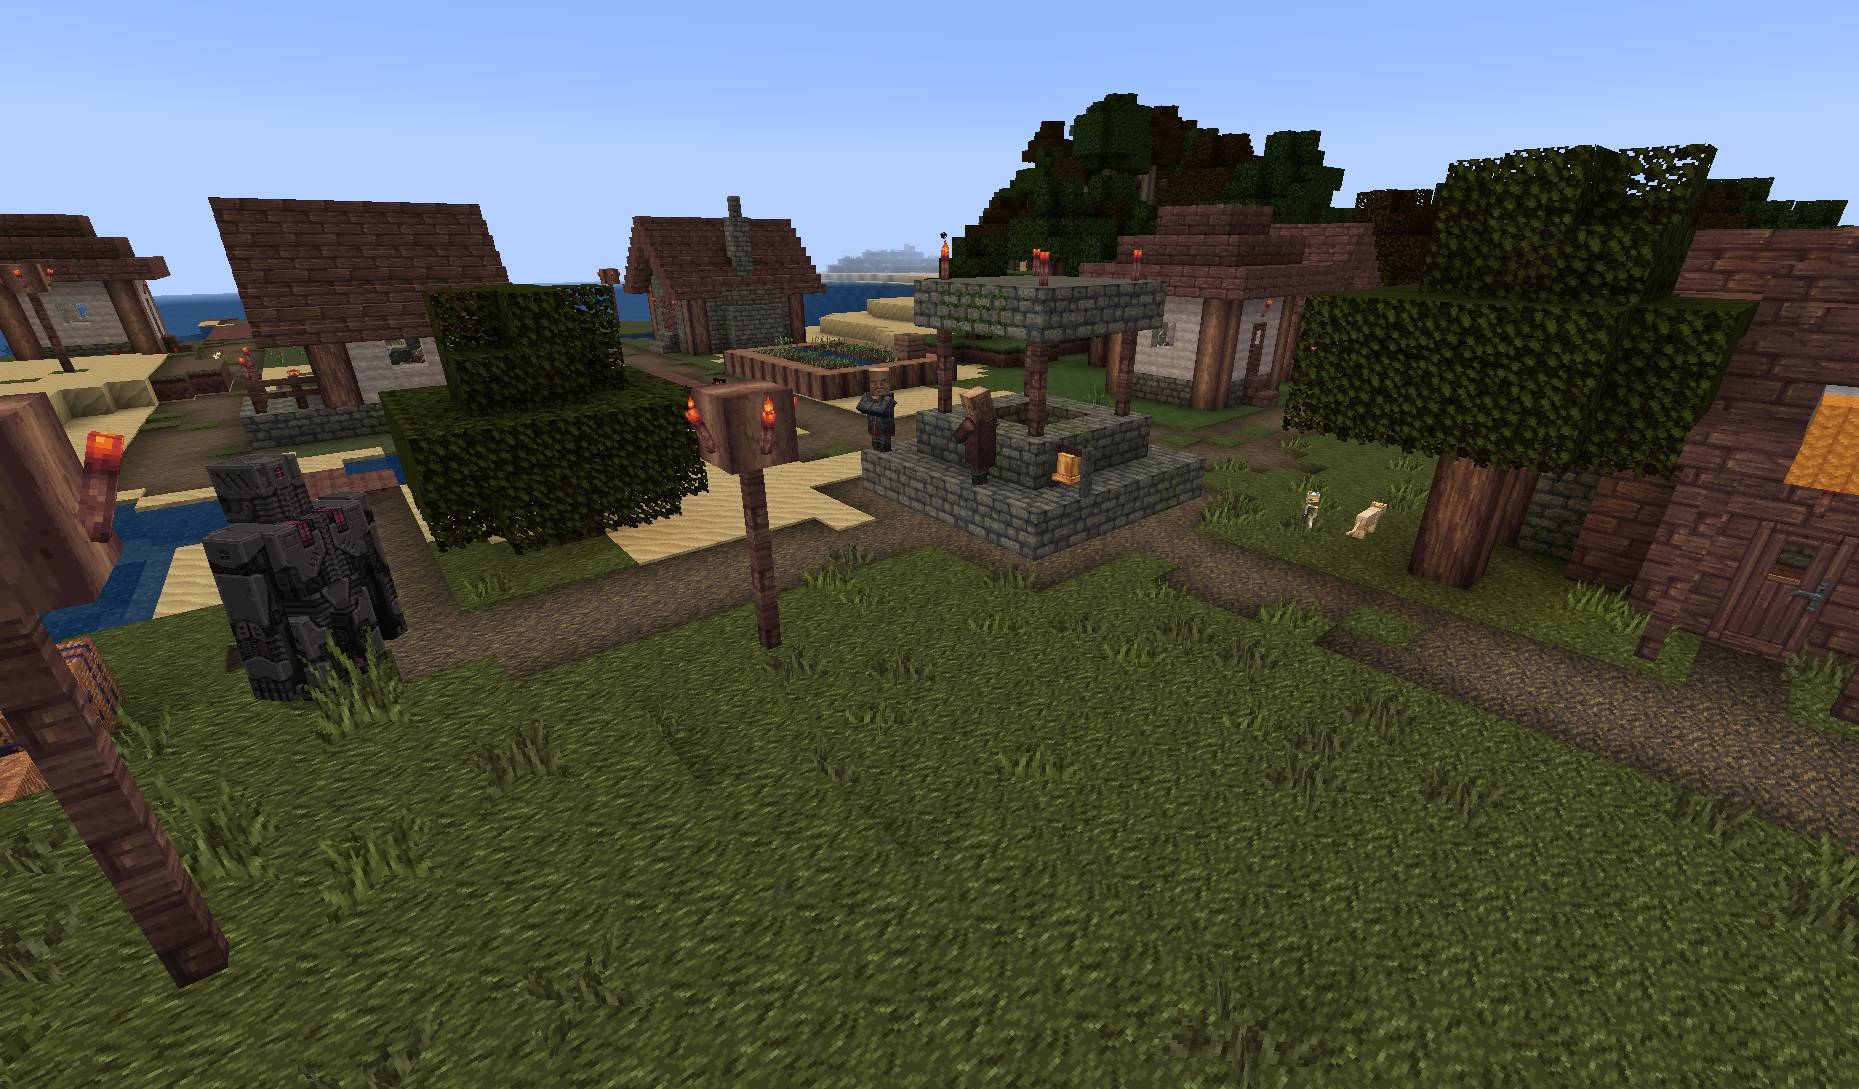 MYTHIC paczka tekstur zasobow 1.15 wioska osadnikow